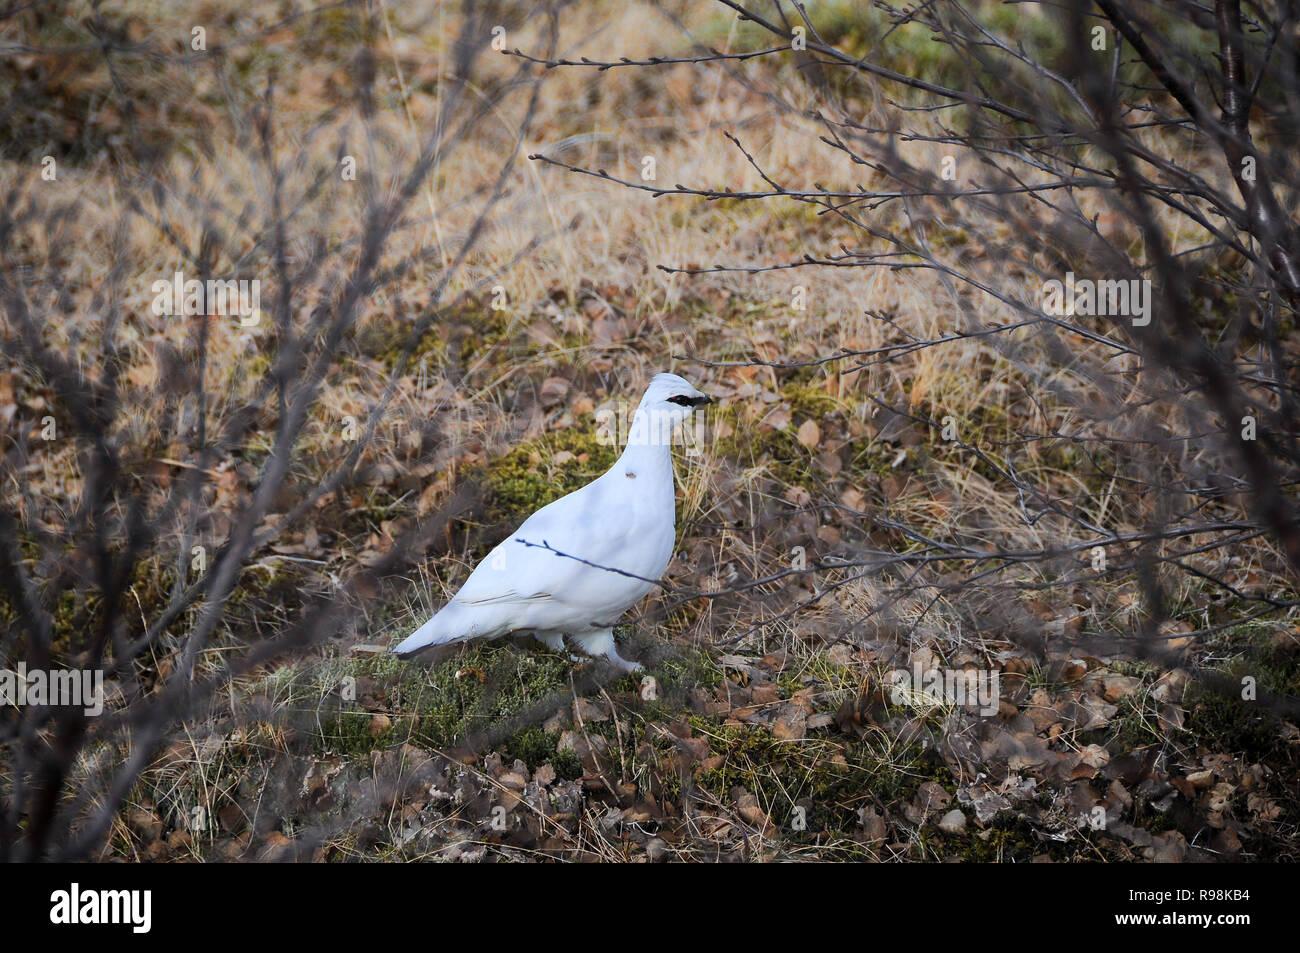 Ptarmigan (Lagopus muta) in its natural habitat. - Stock Image